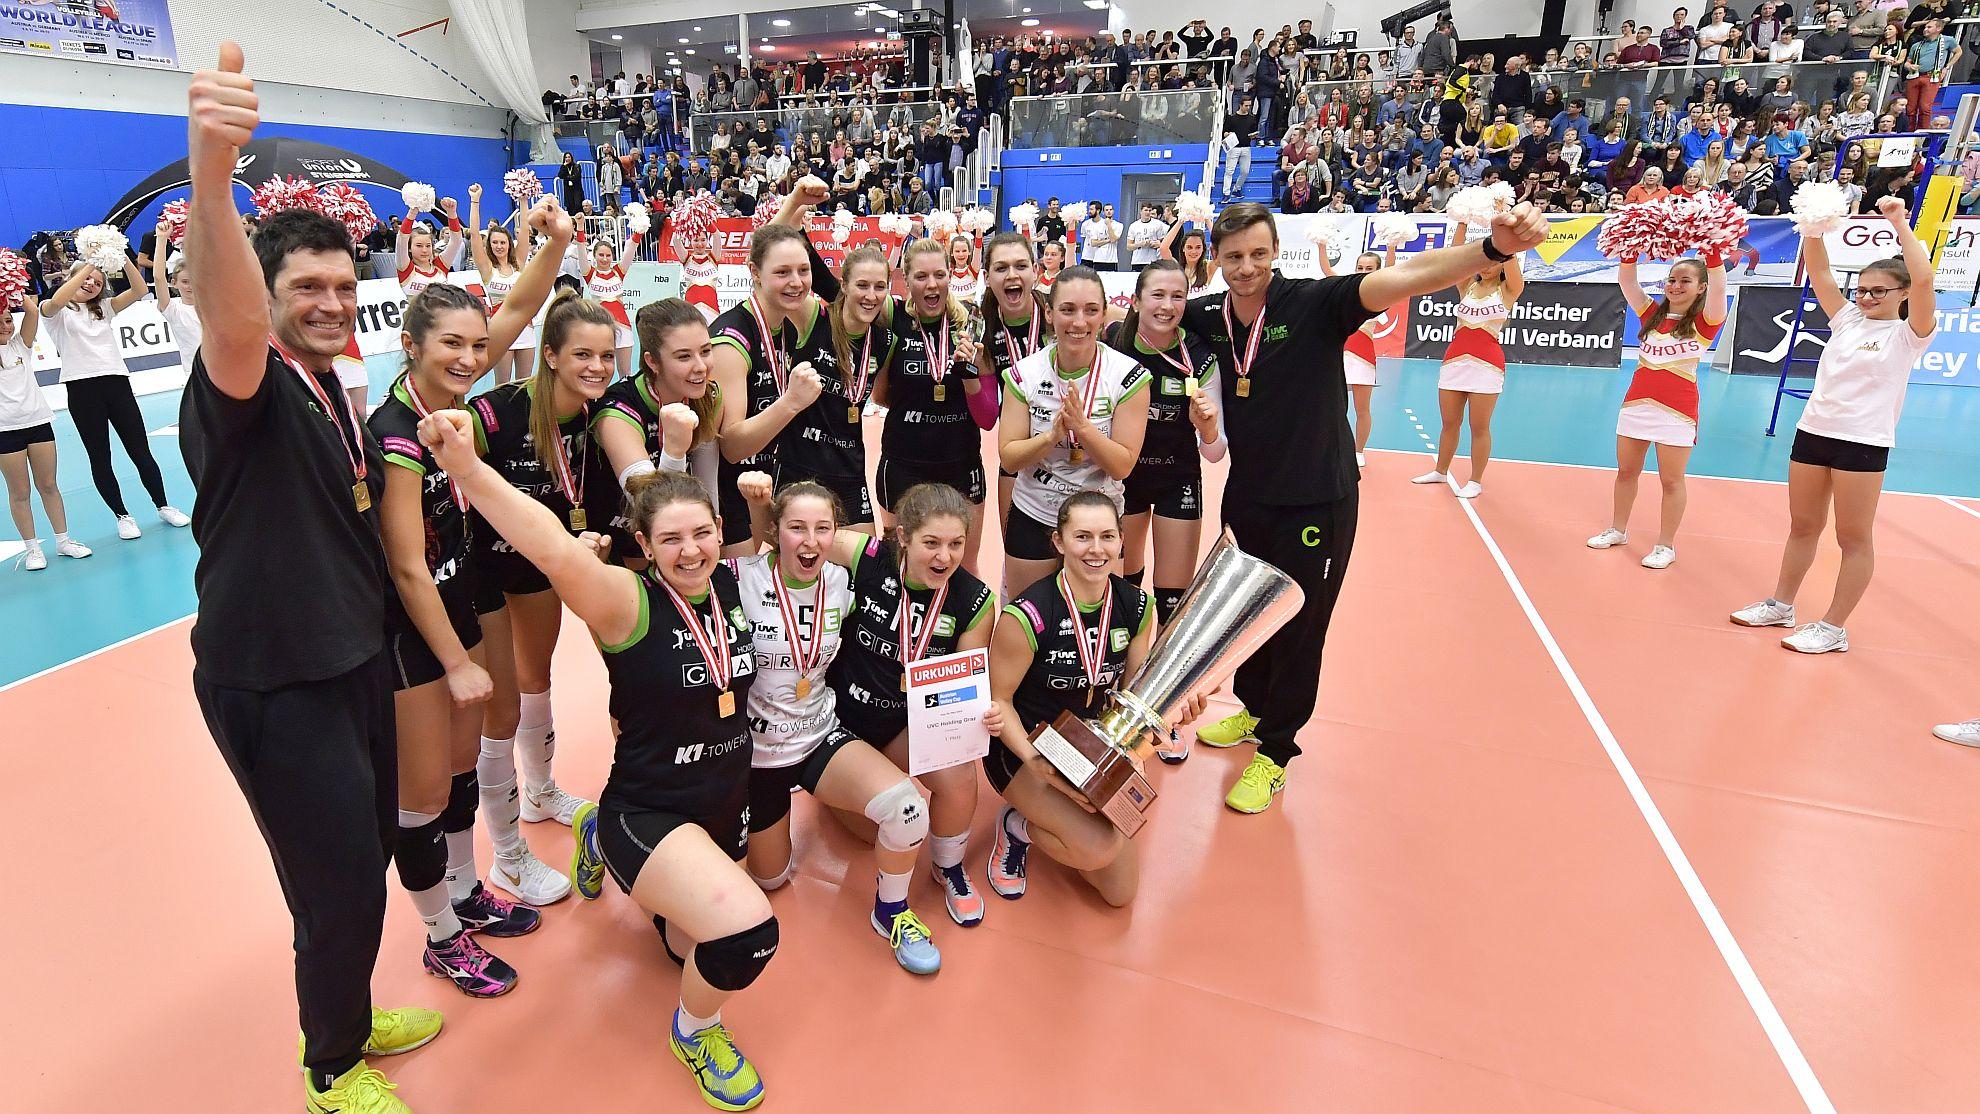 UVC Holding Graz vs SG VB NÖ Sokol/Post, Cupfinale 2018 Frauen - FOTO © ÖVV/Leo Hagen